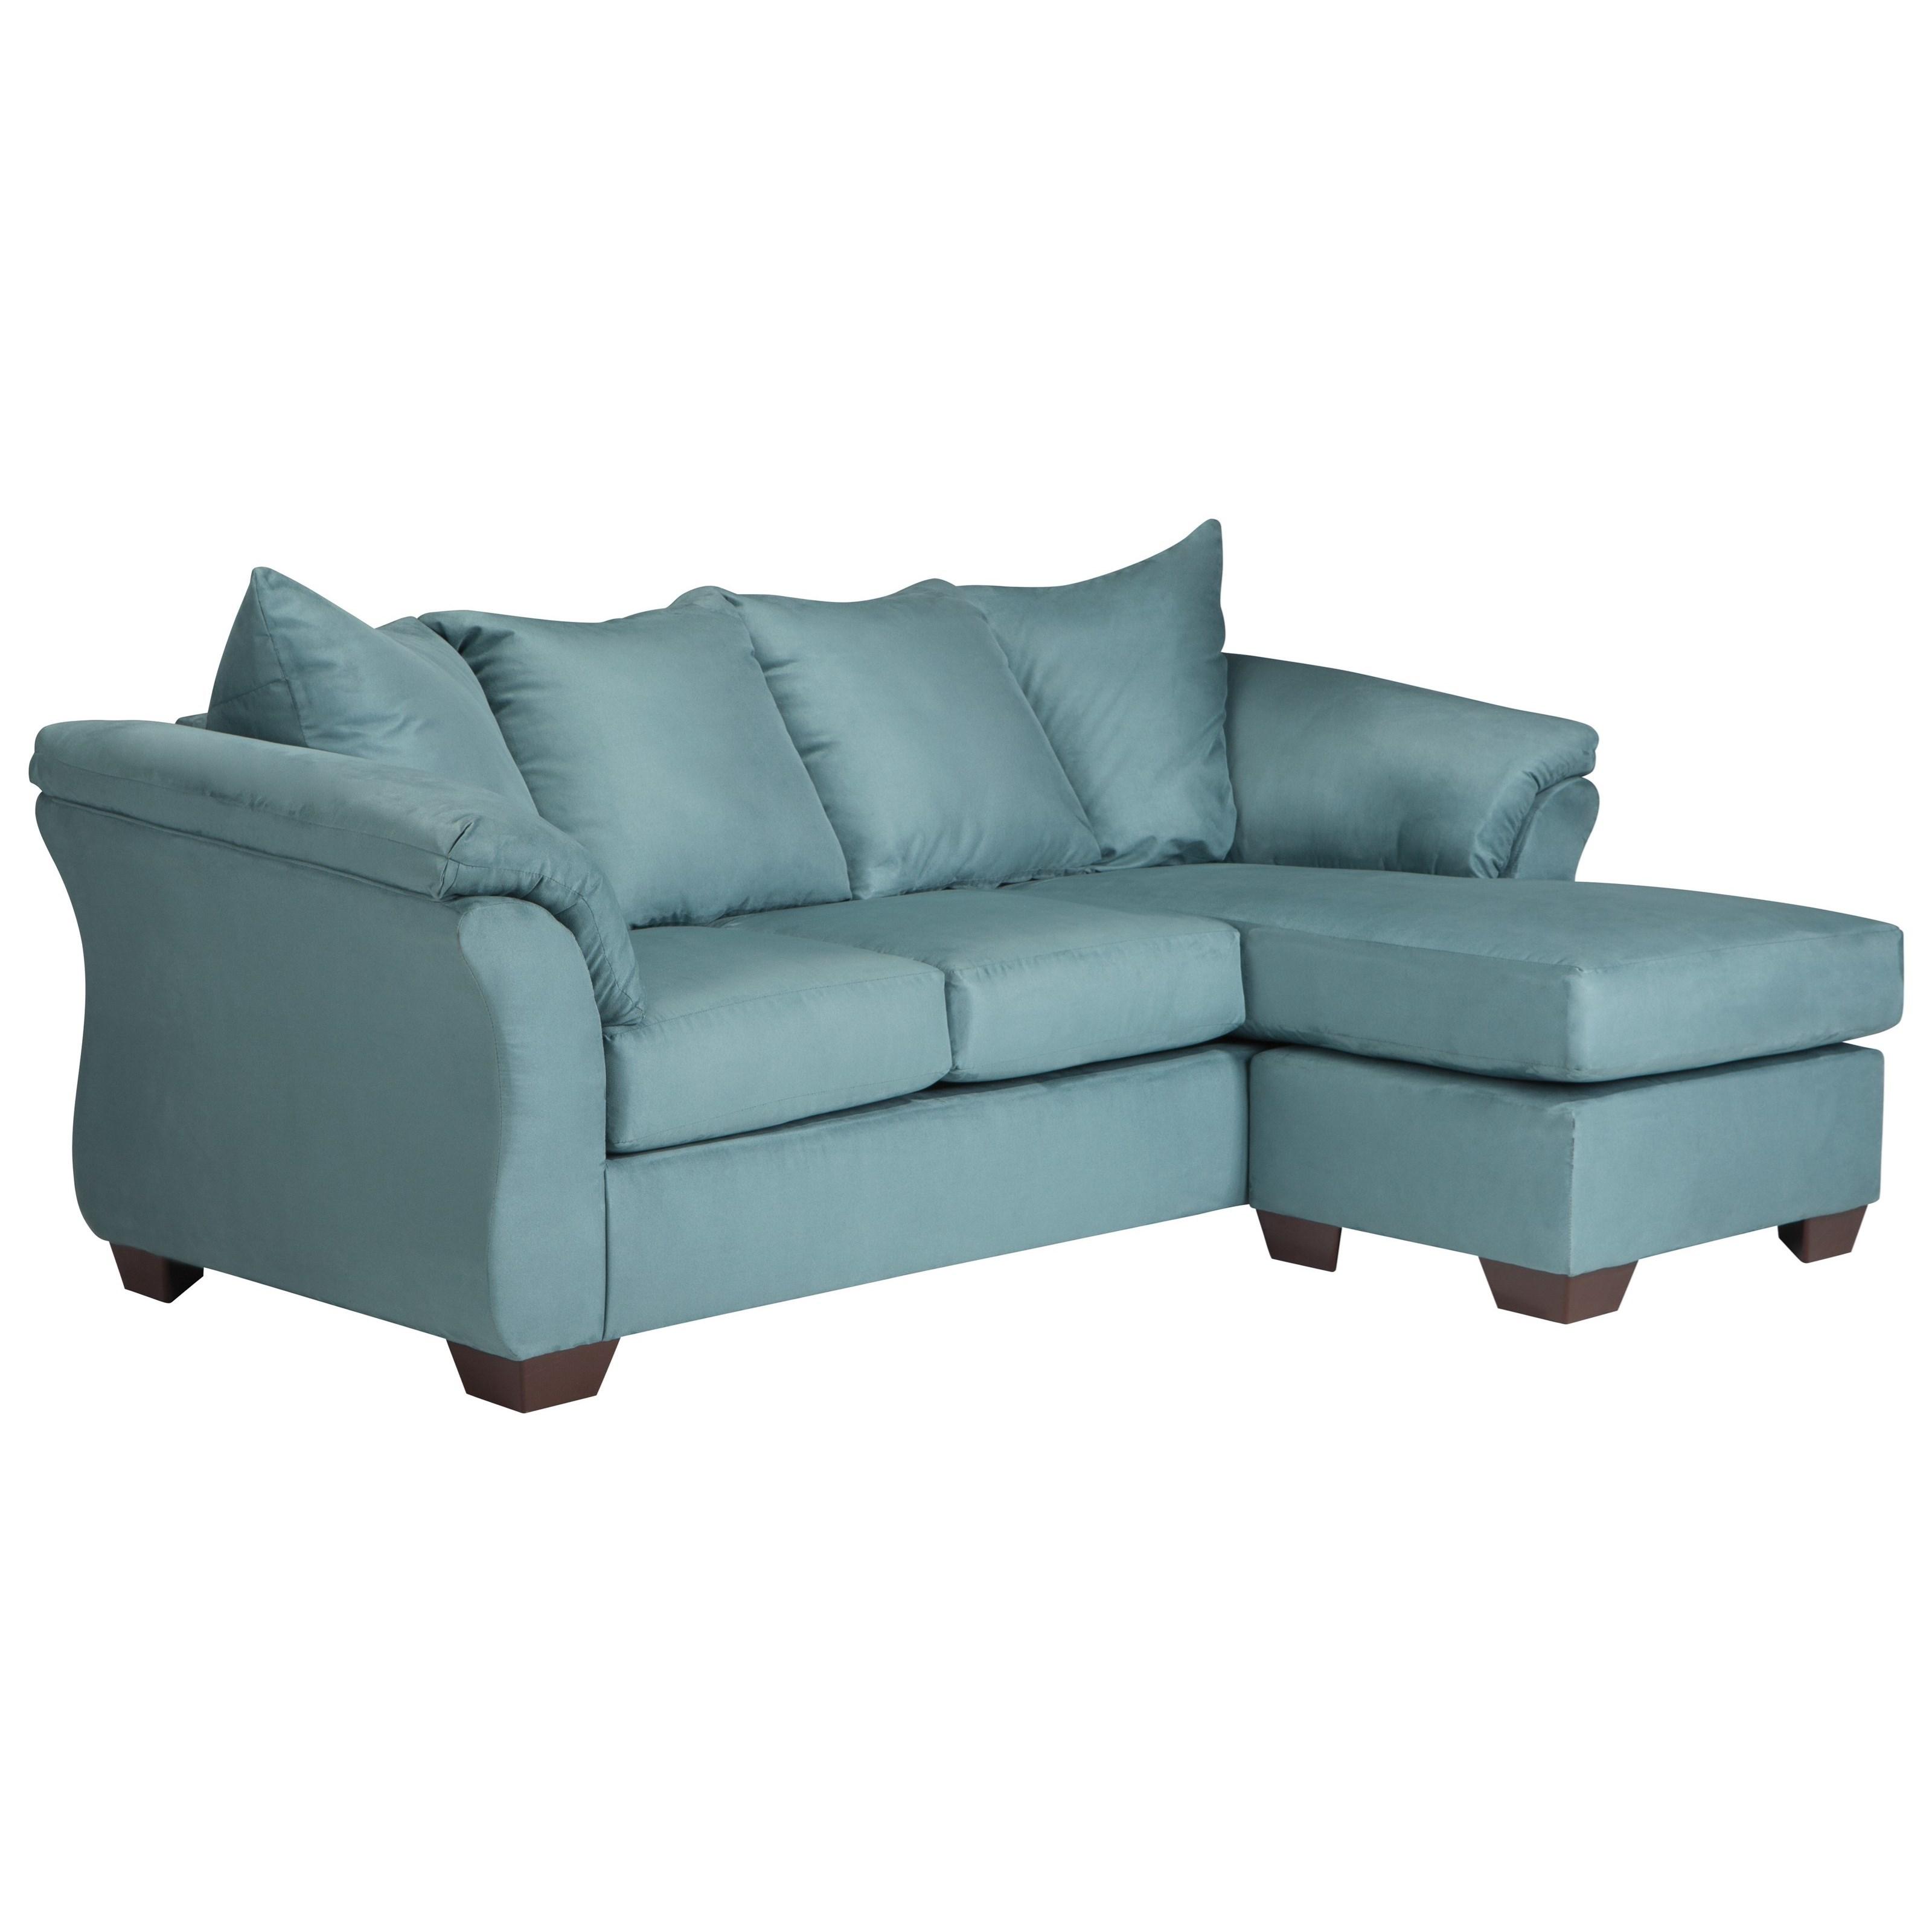 Signature Design by Ashley Vista - Sky Full Sofa Chaise Sleeper - Item Number: 7500658